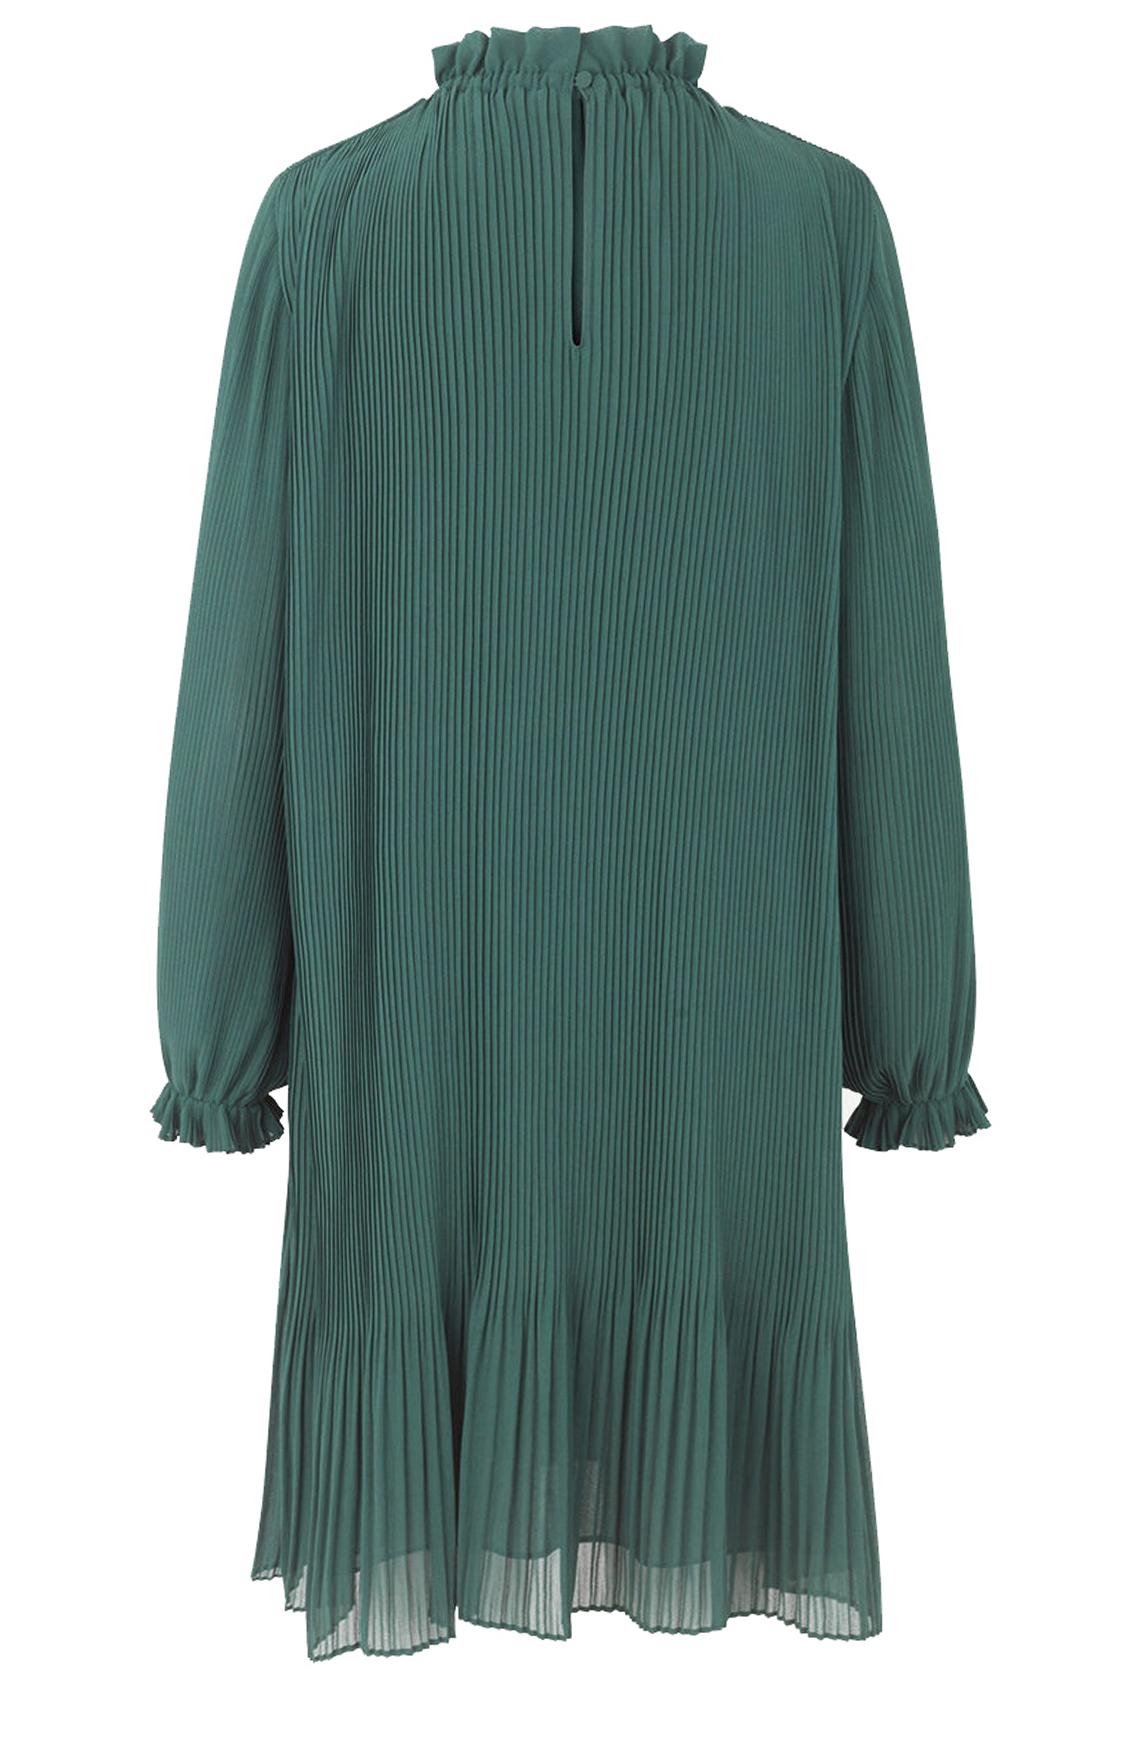 Samsoe Samsoe Dames Mindy plissé jurk groen